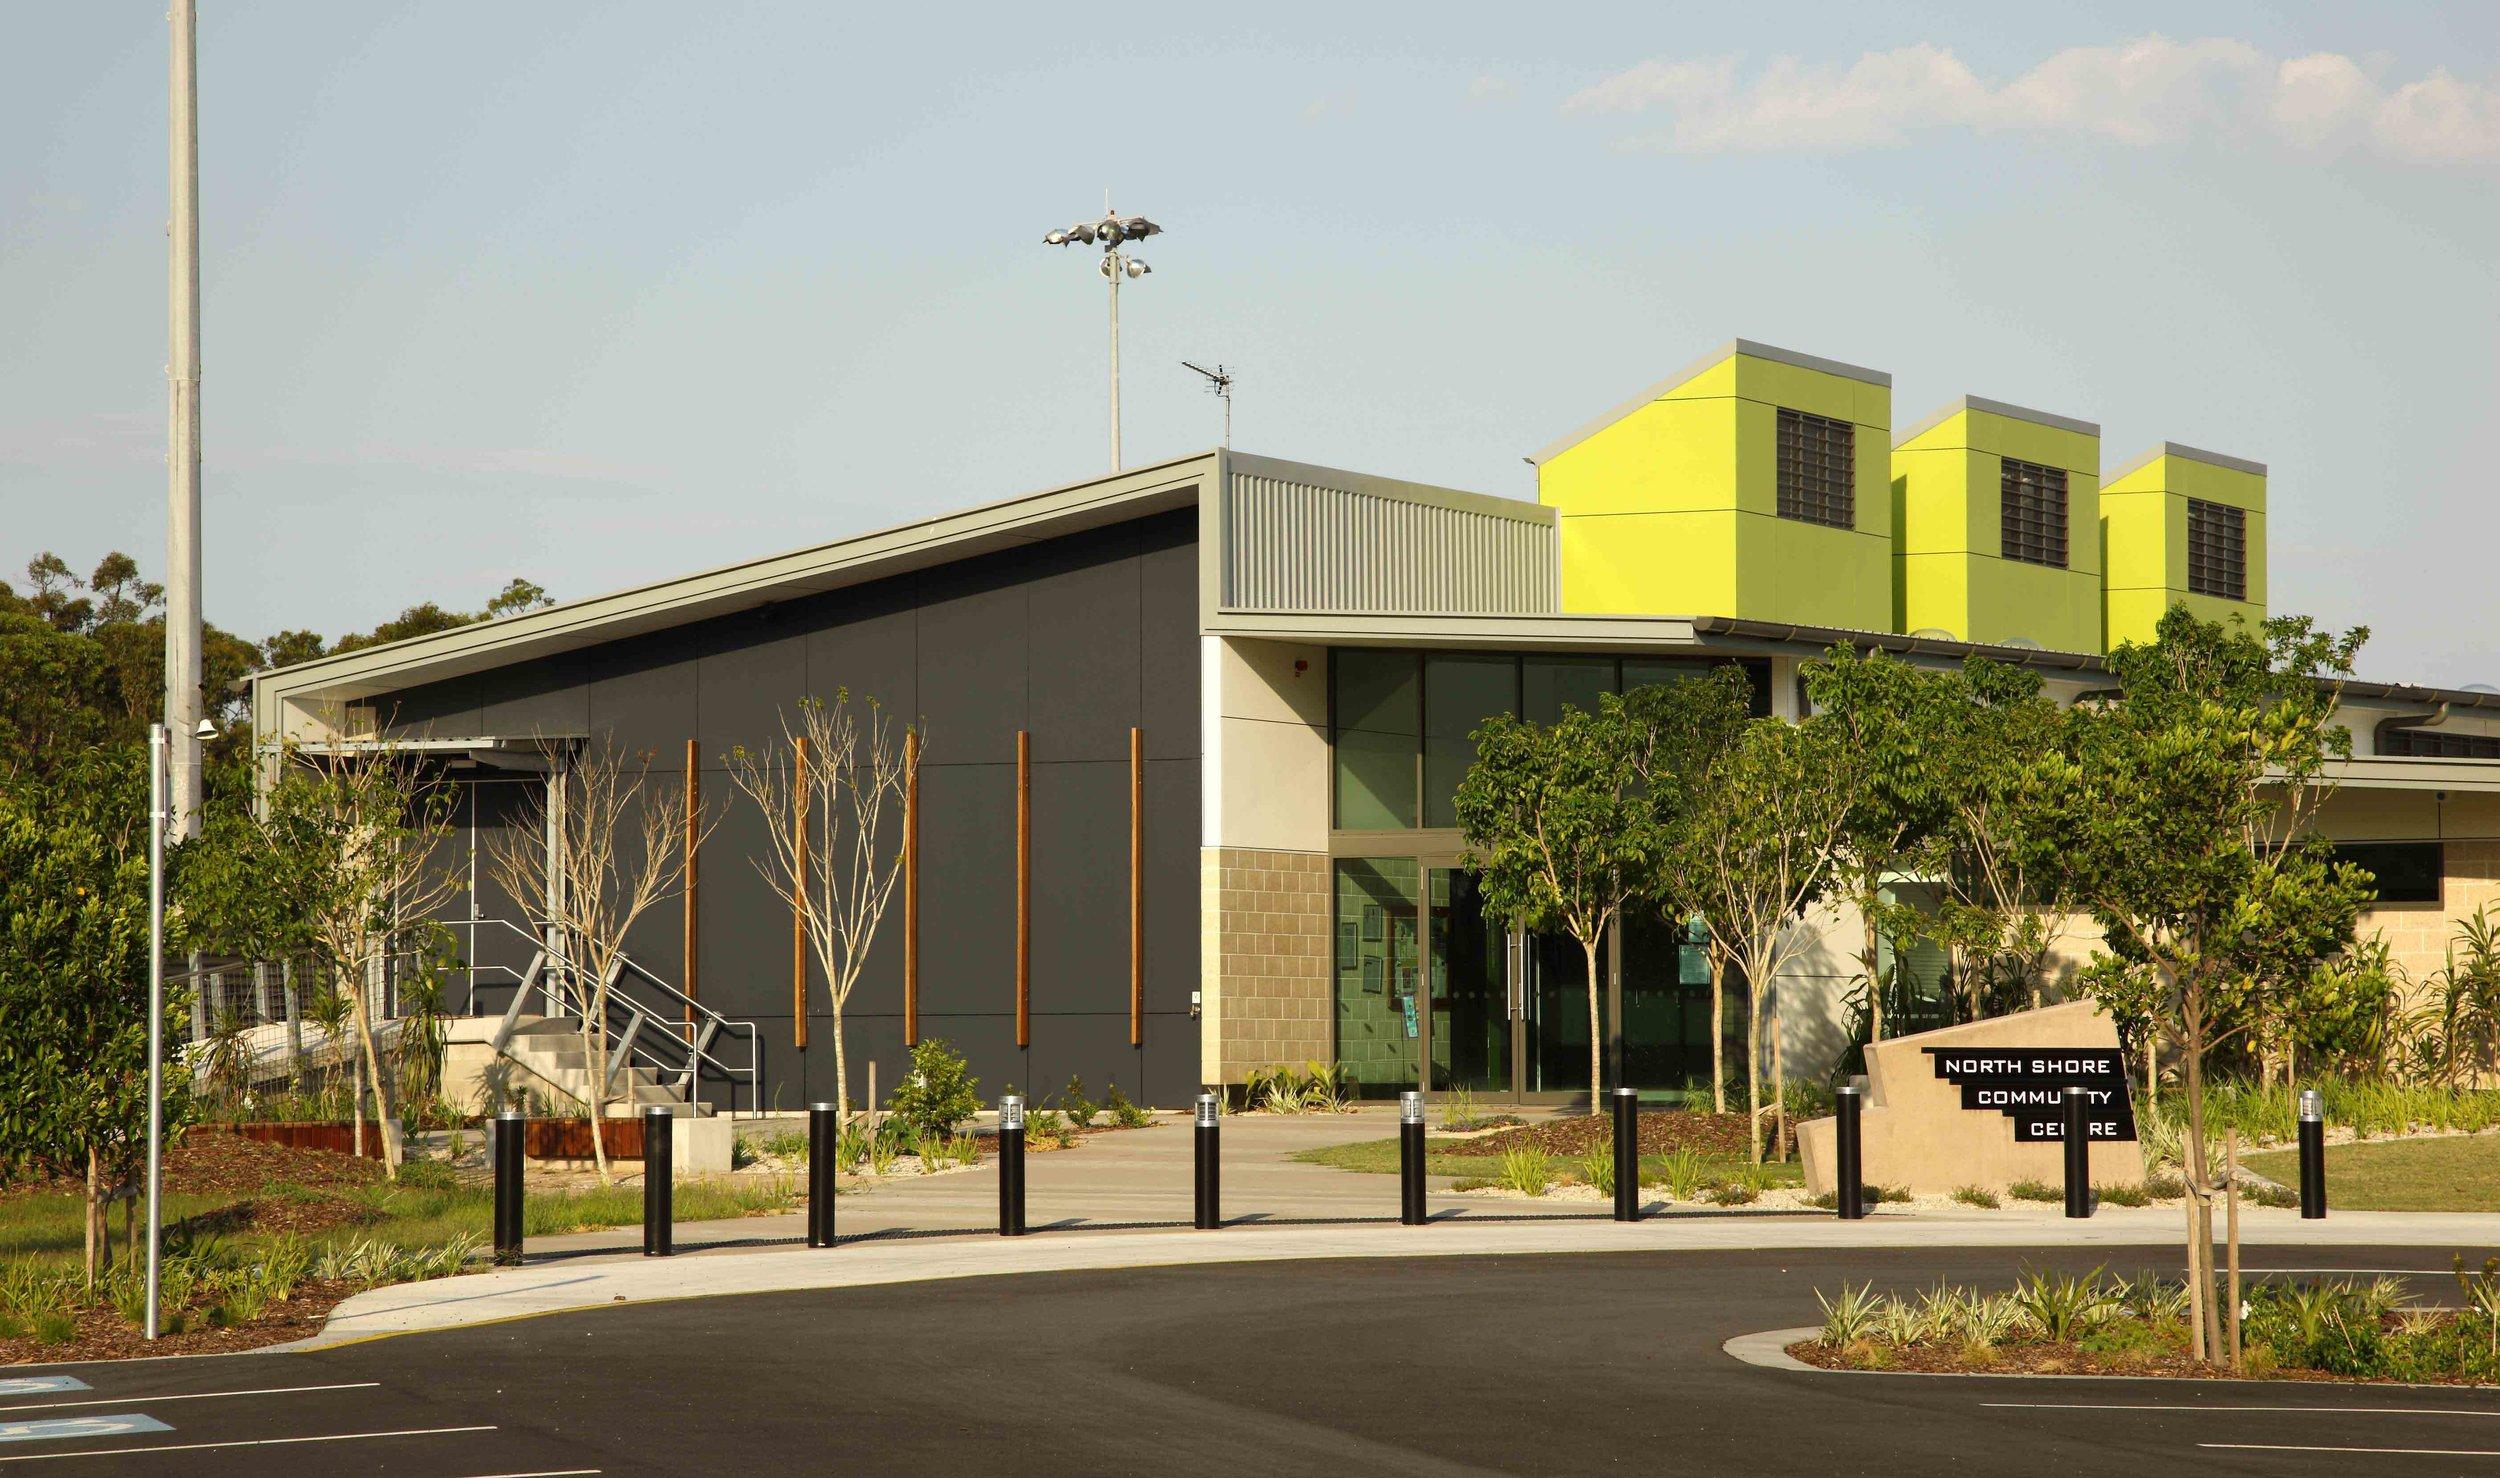 Northshore-Community-Centre-Guymer-Bailey-Architects-01.jpg